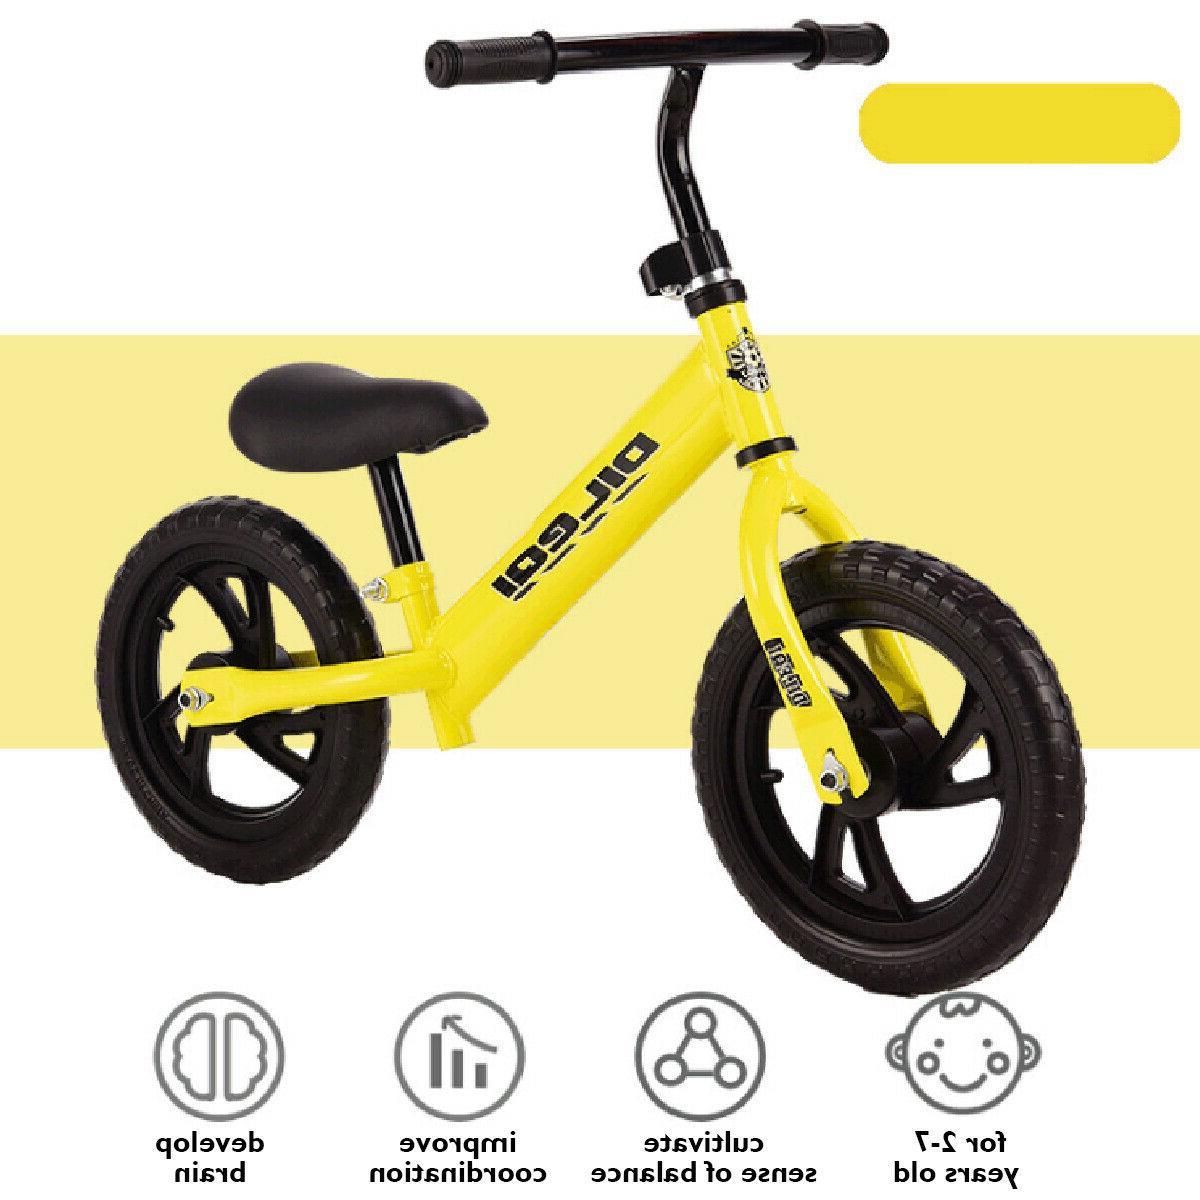 Kids Balance Bike No Pedal Childs Bicycle w/ Adjustable Seat